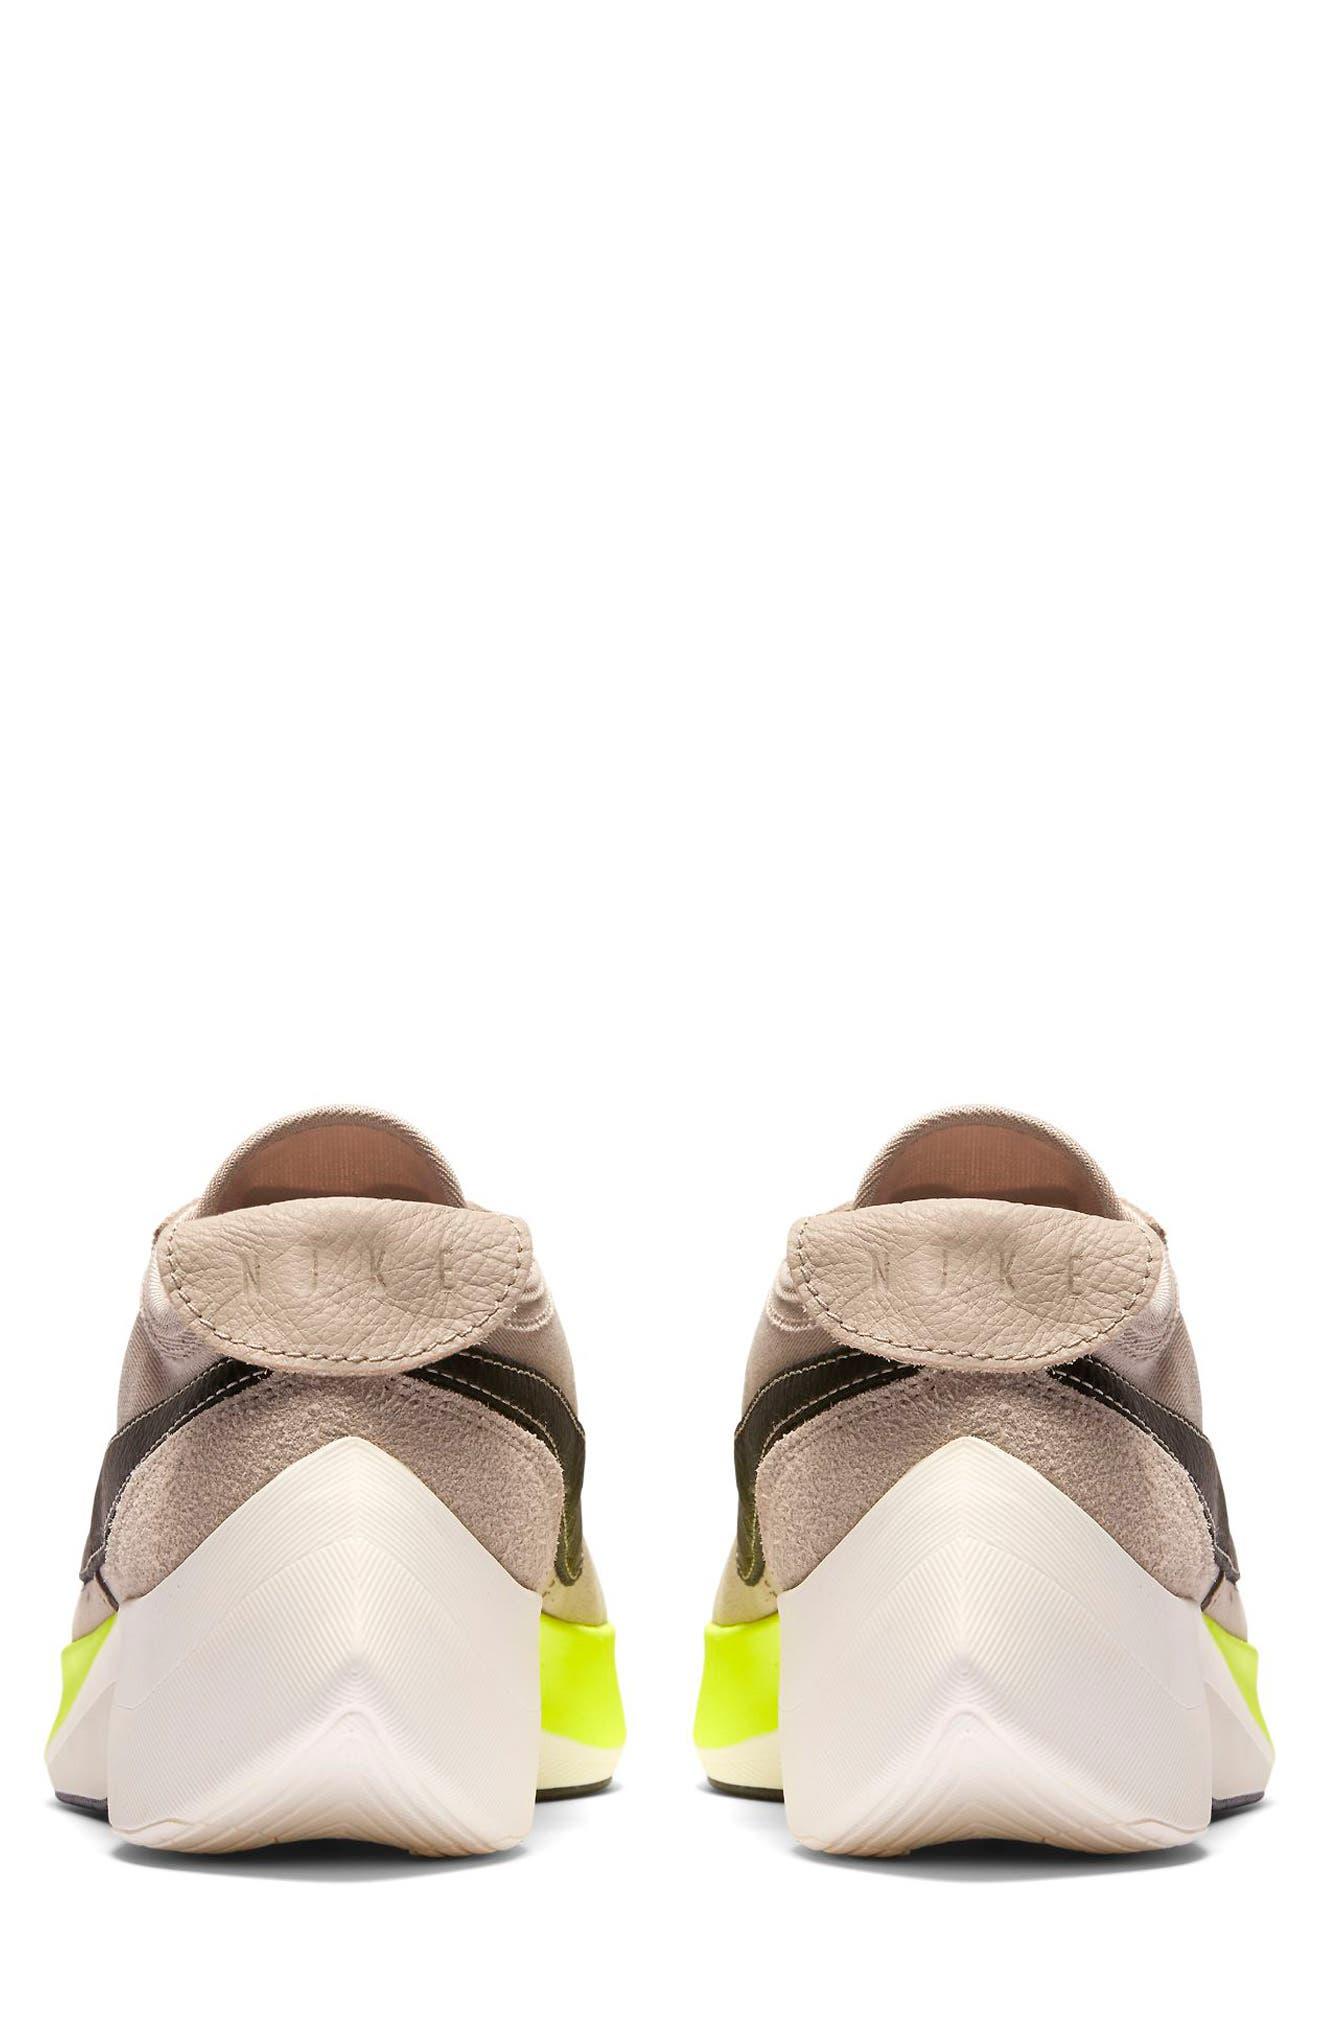 Moon Racer Sneaker,                             Alternate thumbnail 2, color,                             STRING/ BLACK/ SAIL/ VOLT